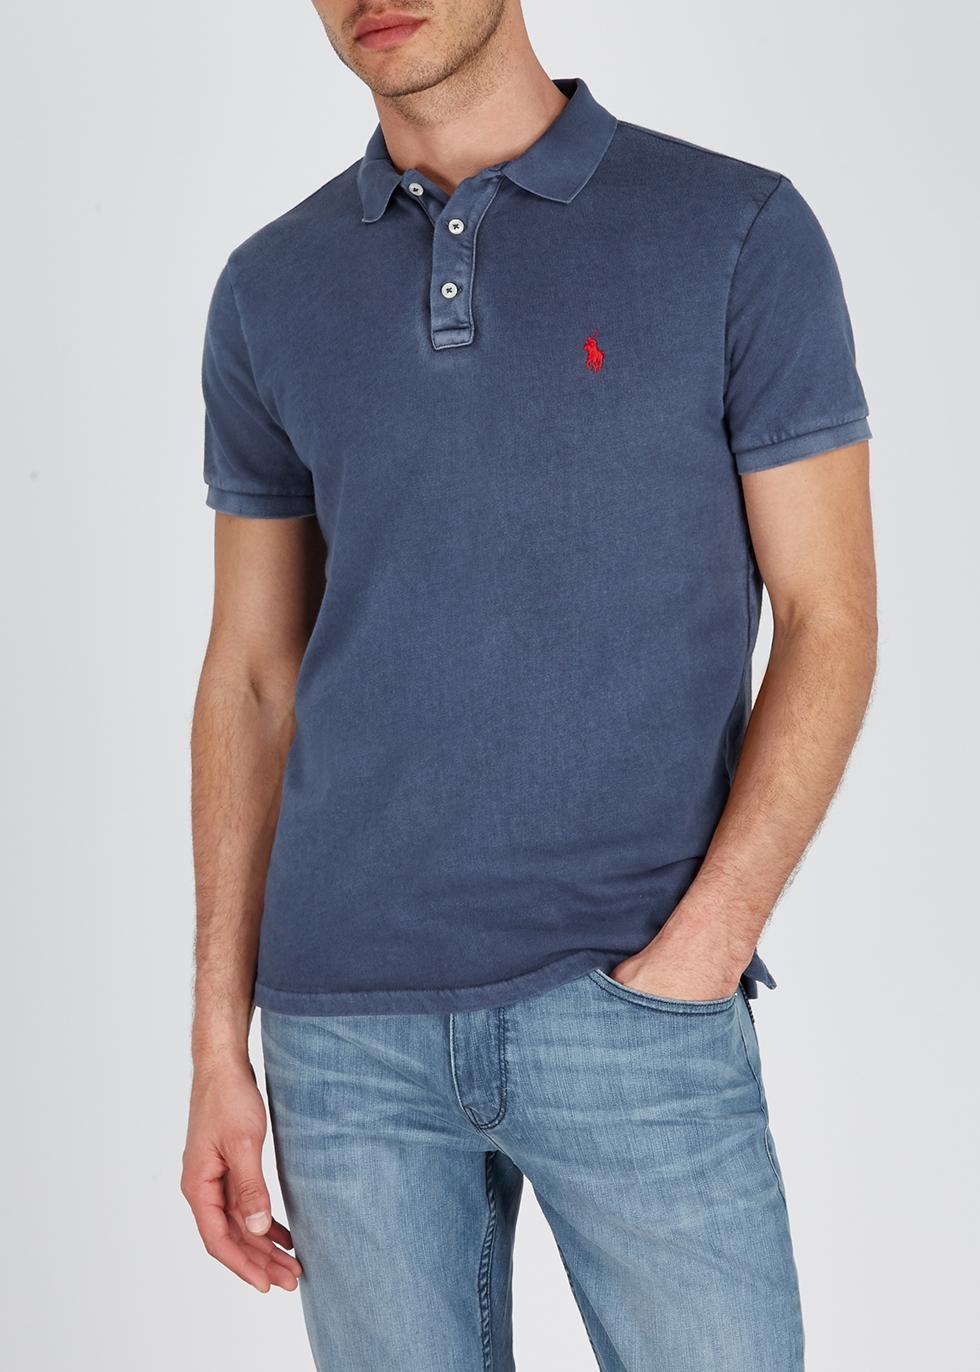 Navy towelling cotton polo shirt - Polo Ralph Lauren